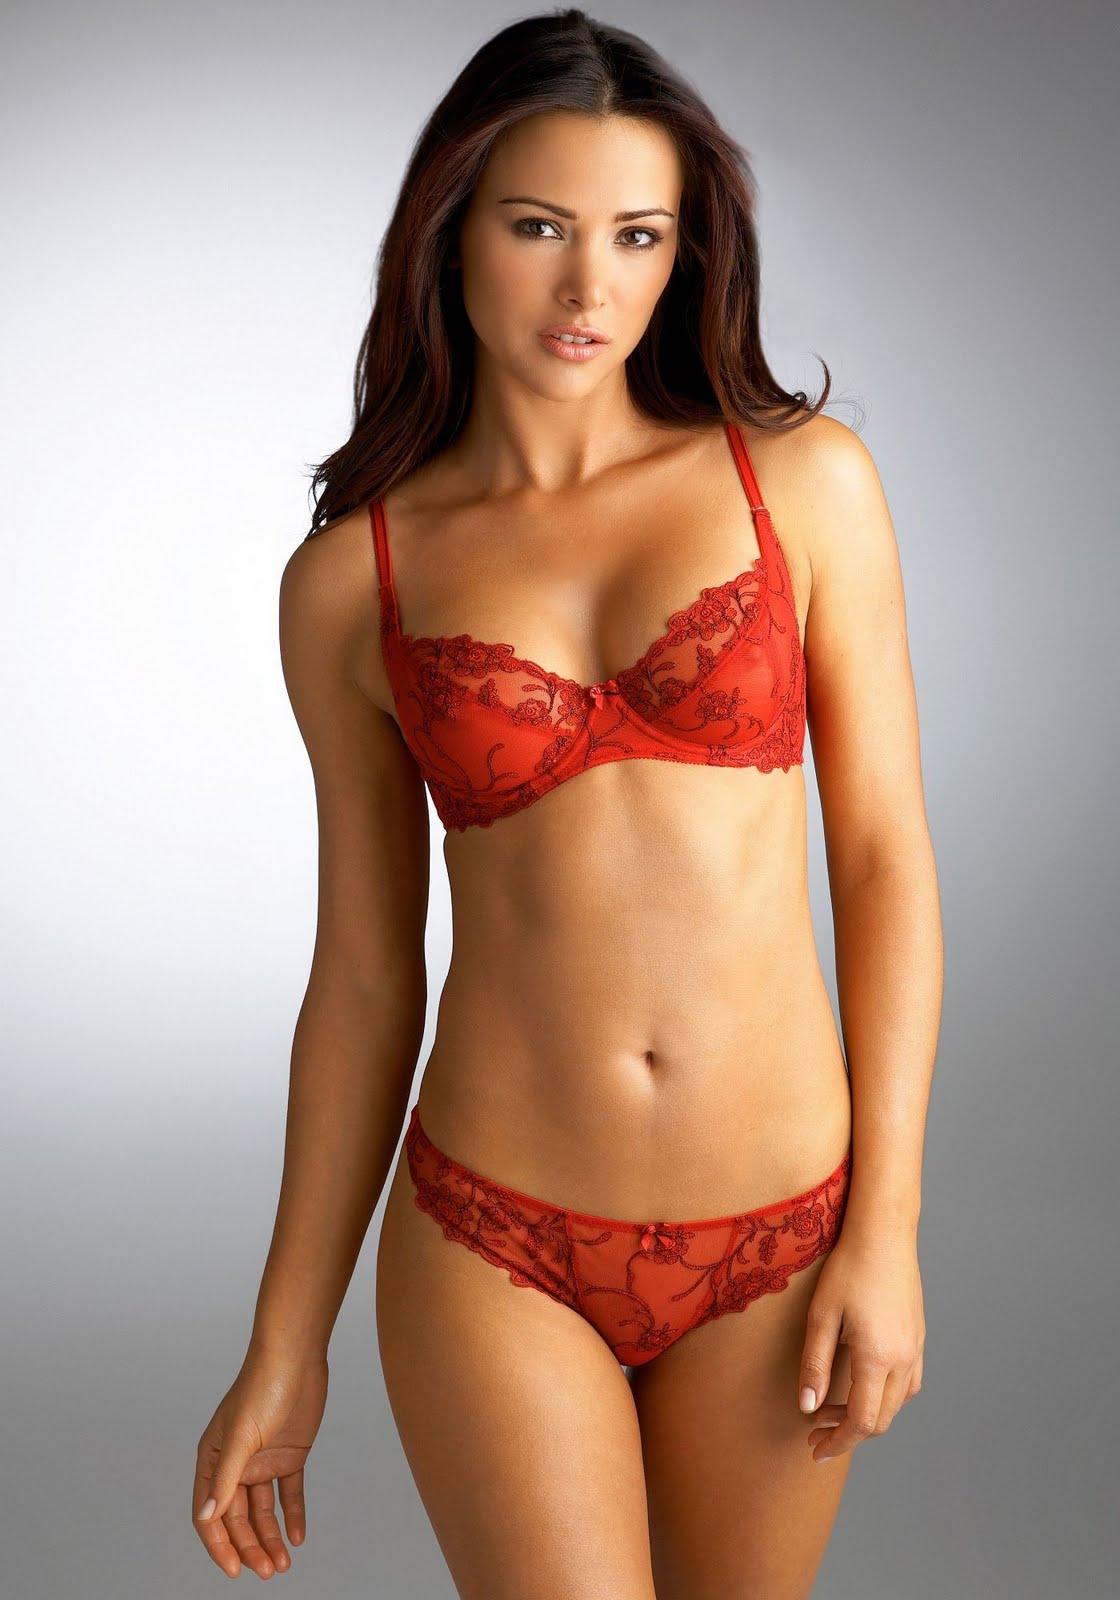 Bikini Hope Alina naked (28 pics), Twitter